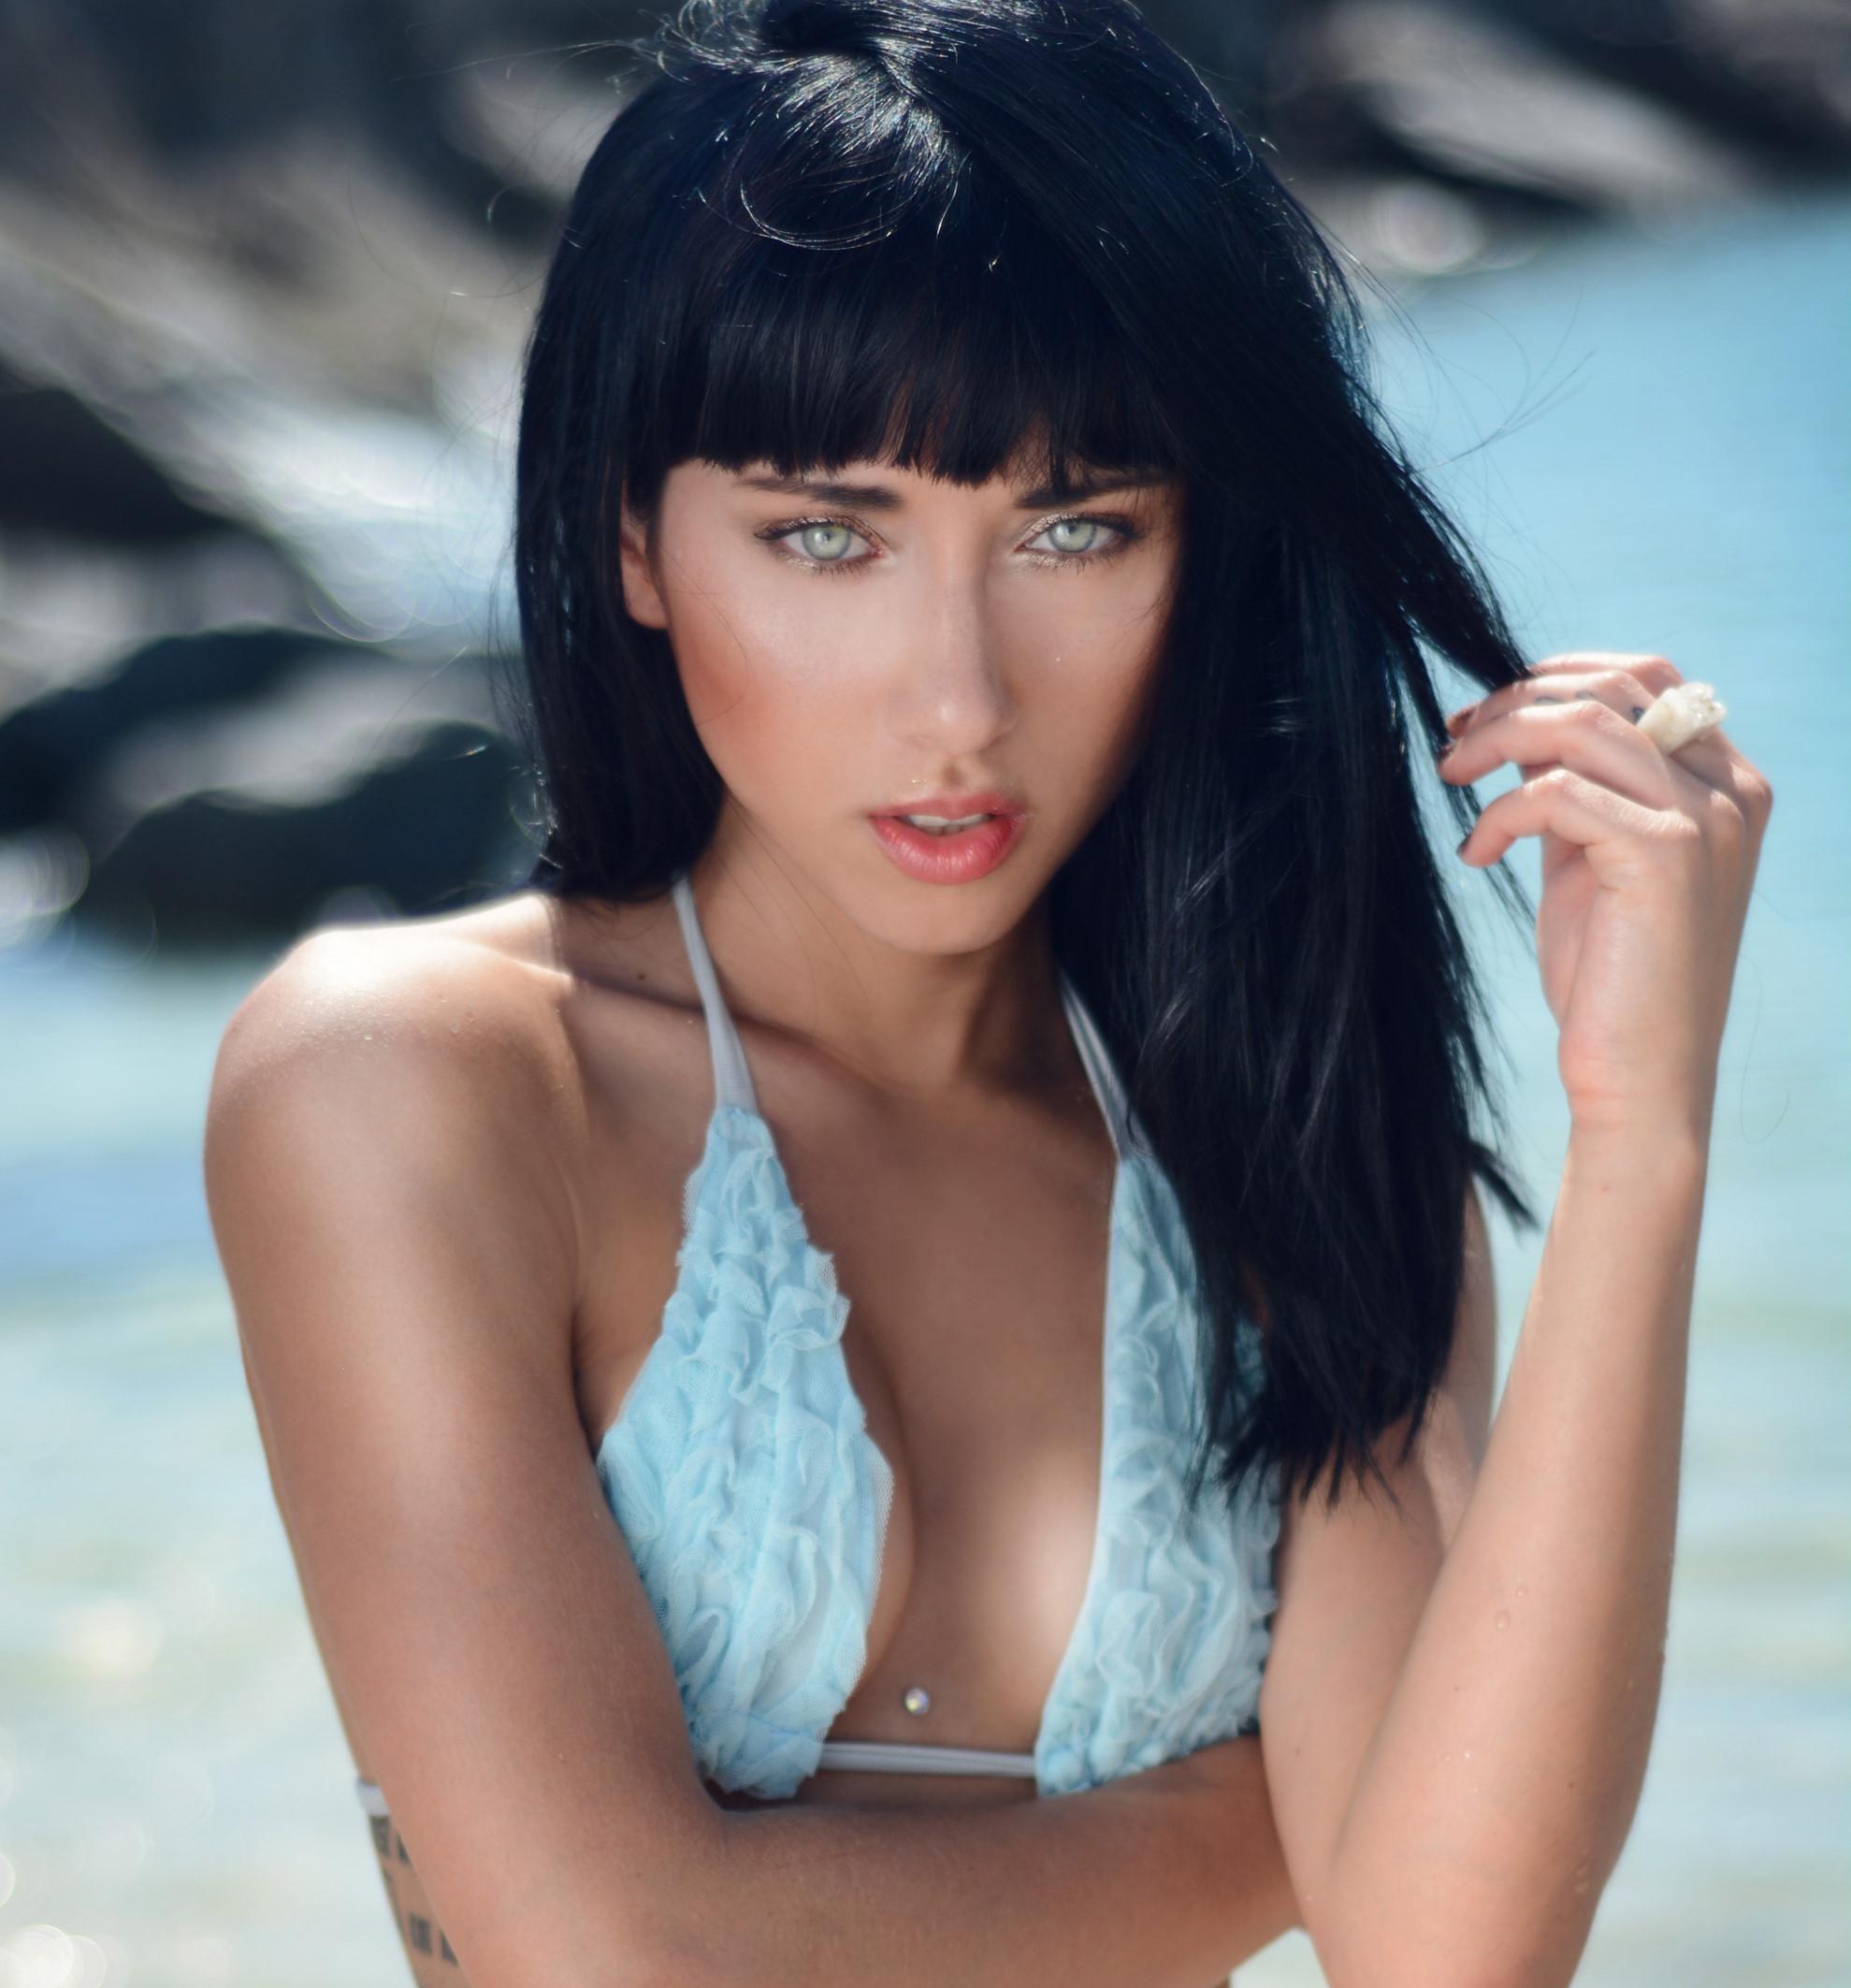 – 3 c Sunamys Villalba Katherine Eastman portrait photography Miami south florida beauty mermaid austrailian blog make up artist